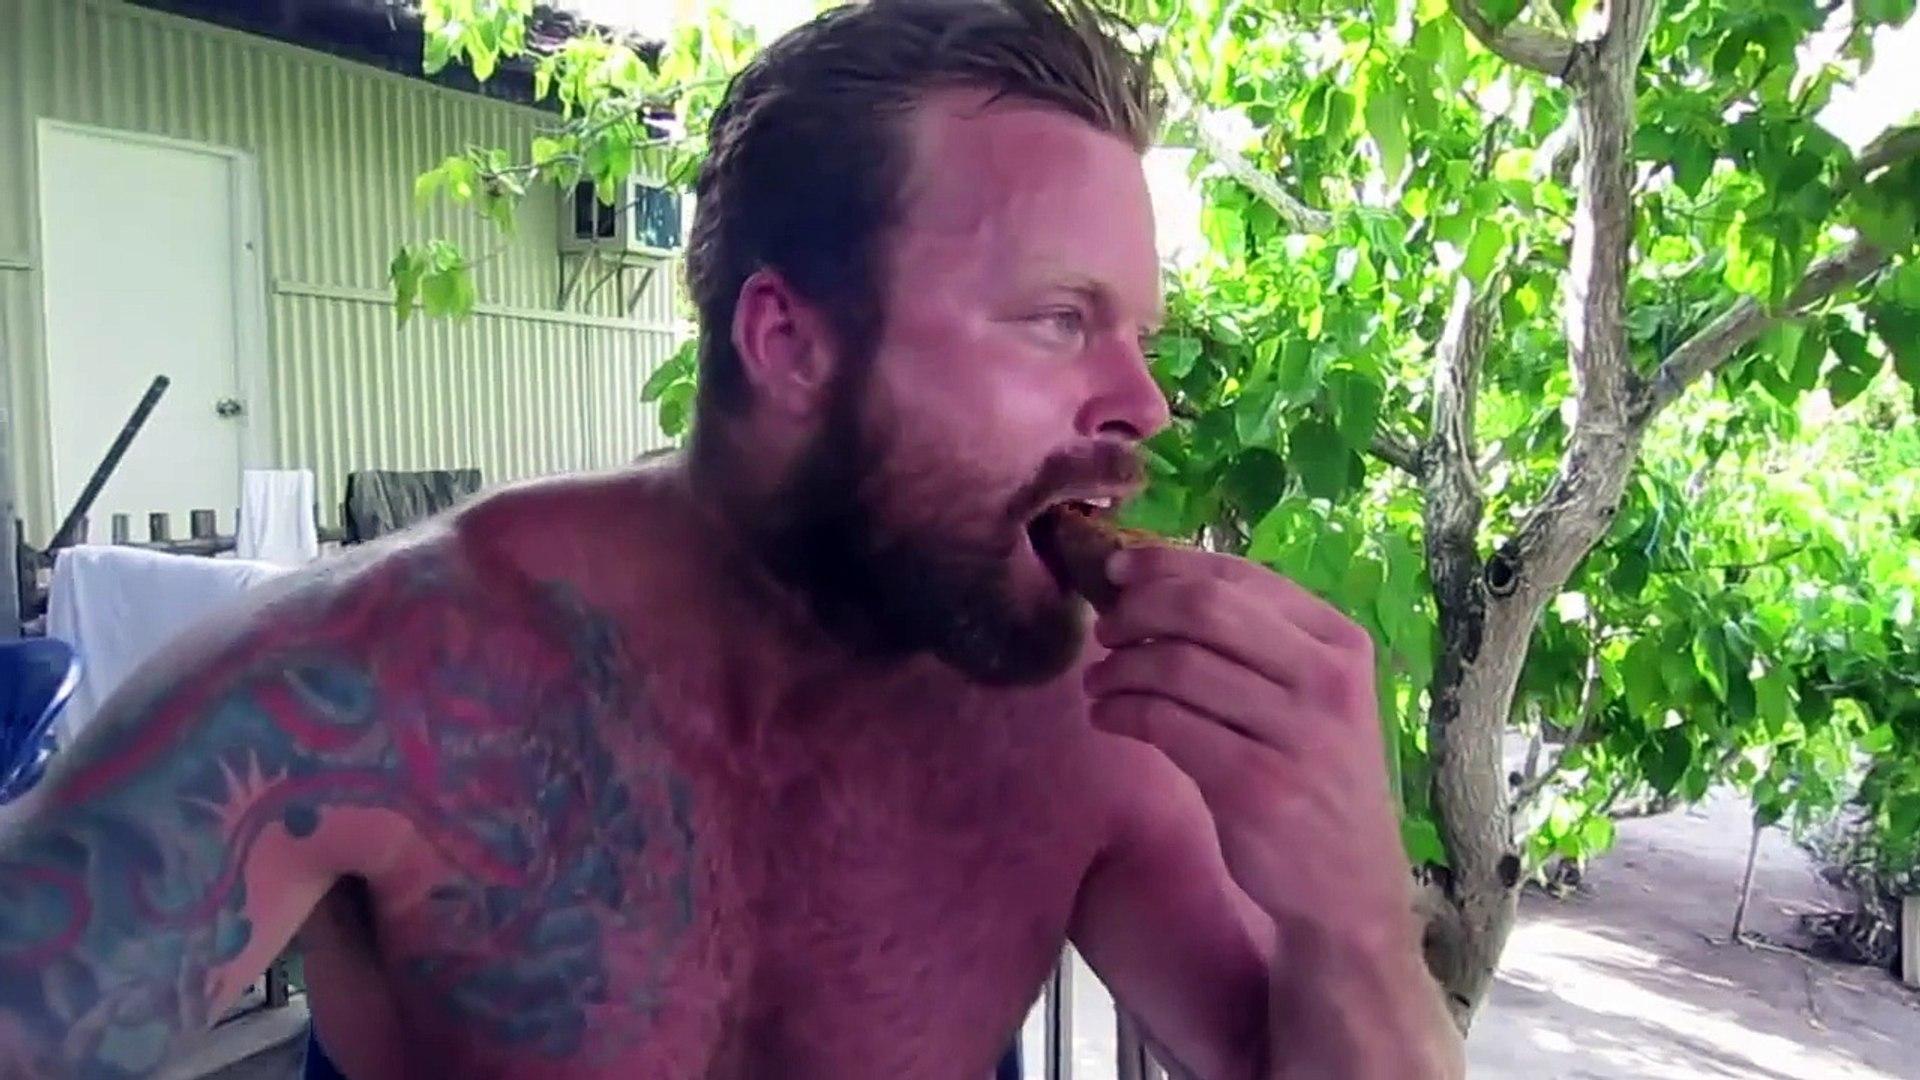 Allison Naked And Afraid naked and afraid alison teal and jonathan klay eat first